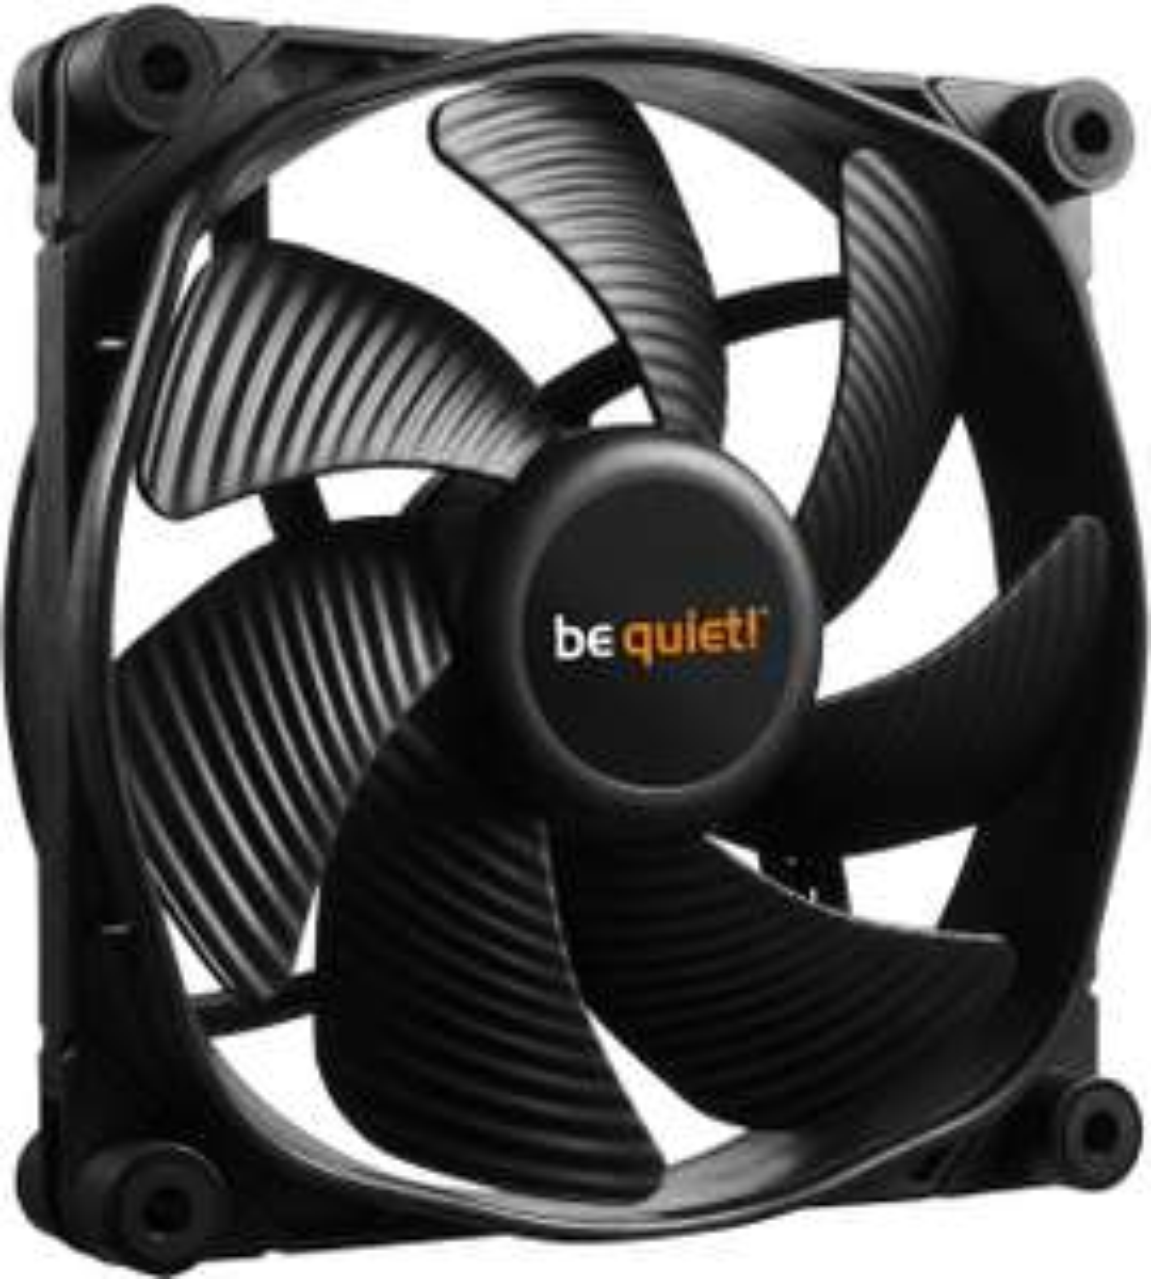 Be Quiet! Silent Wings 3 PC-Gehäuselüfter (120 mm, 3-Pin) [Prime oder Abholstation]